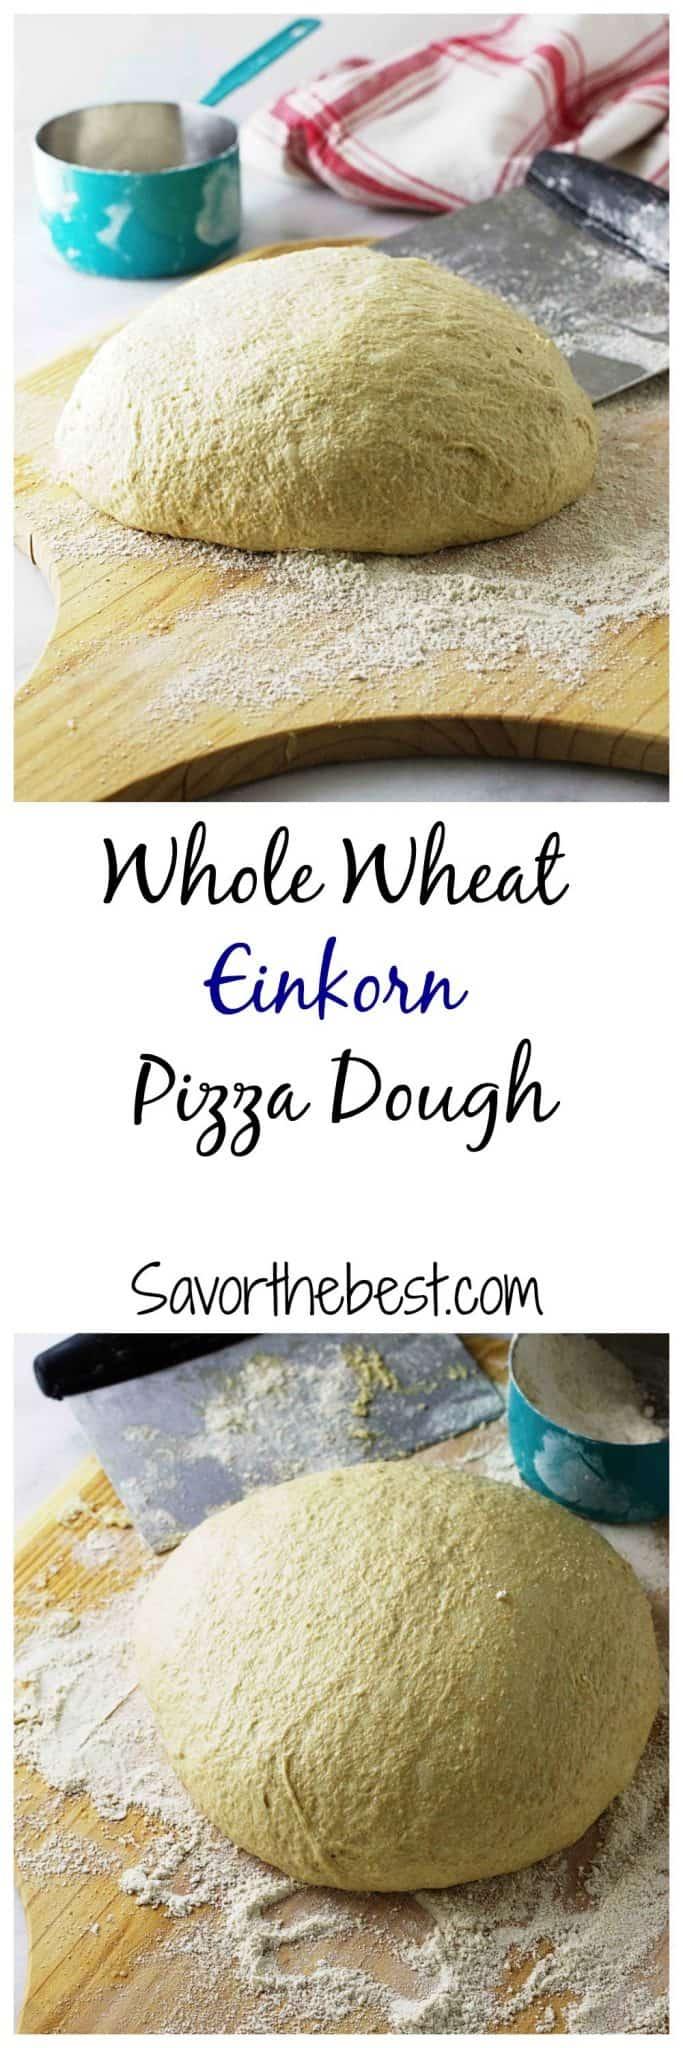 whole wheat einkorn pizza dough